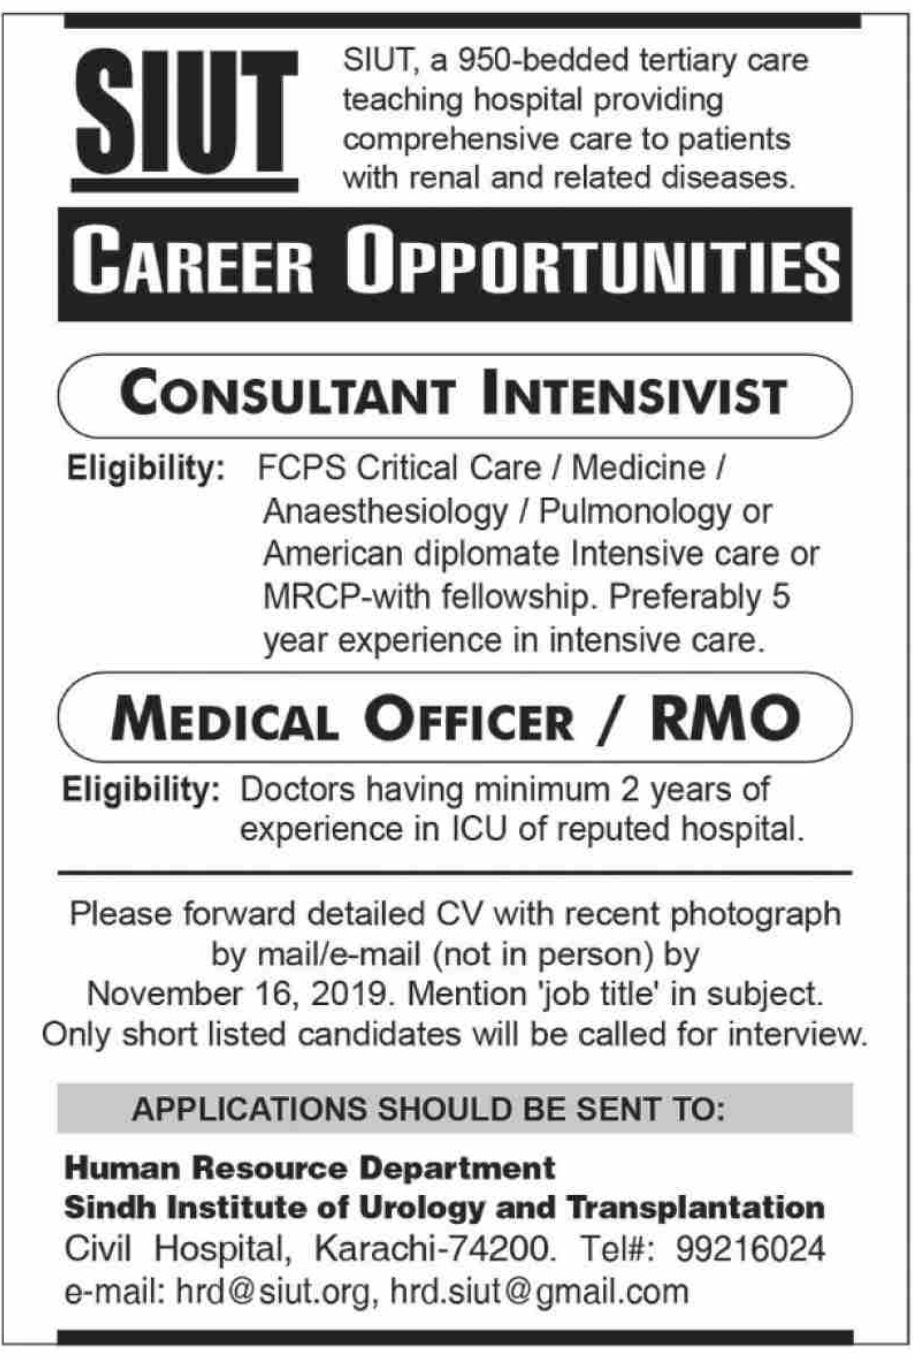 Sindh Institute of Urology and Transplantation SIUT Medical Posts Karachi 2019